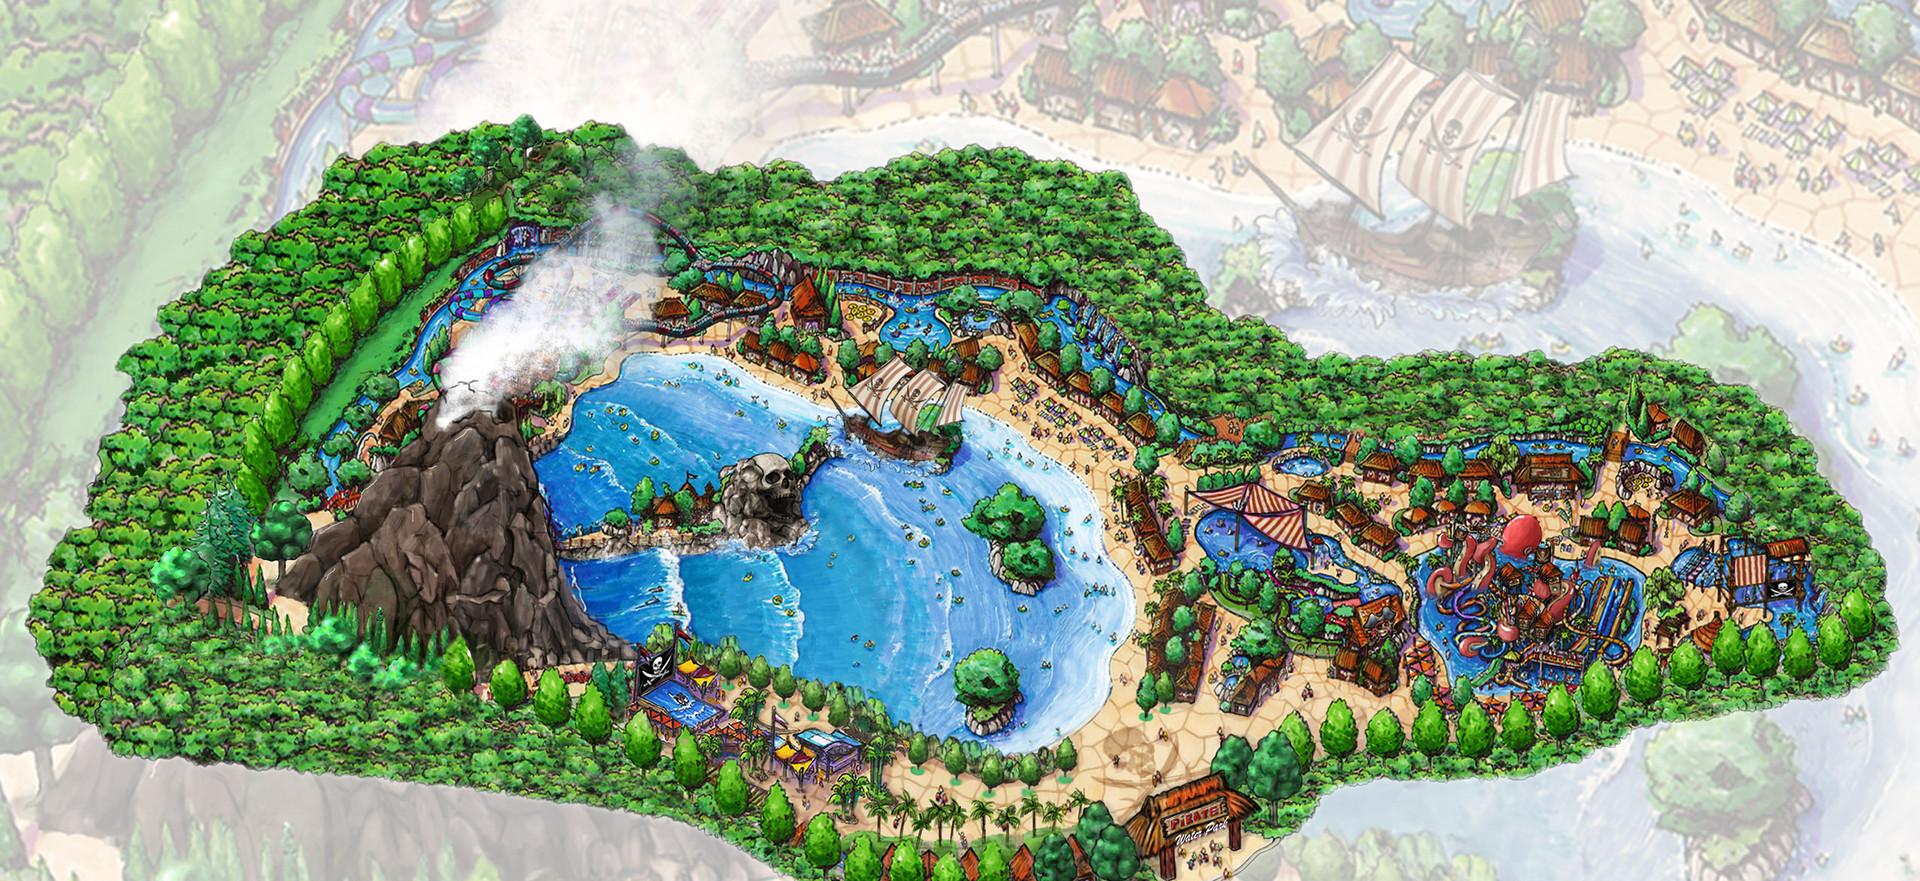 Pirate Island Water Park